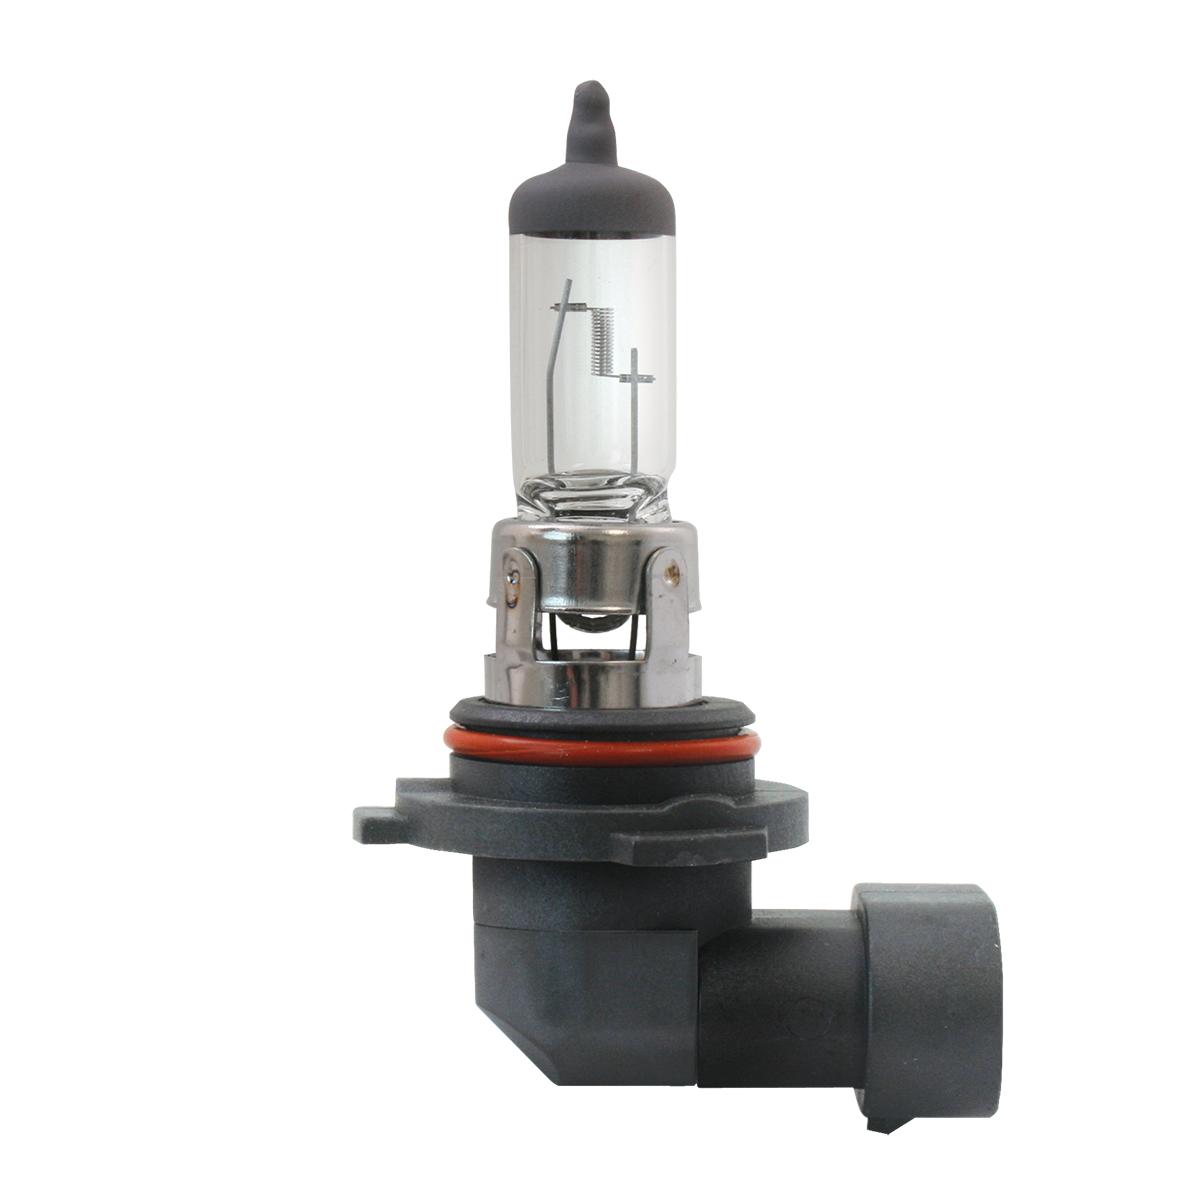 Clear 9006 Headlight Halogen Bulb